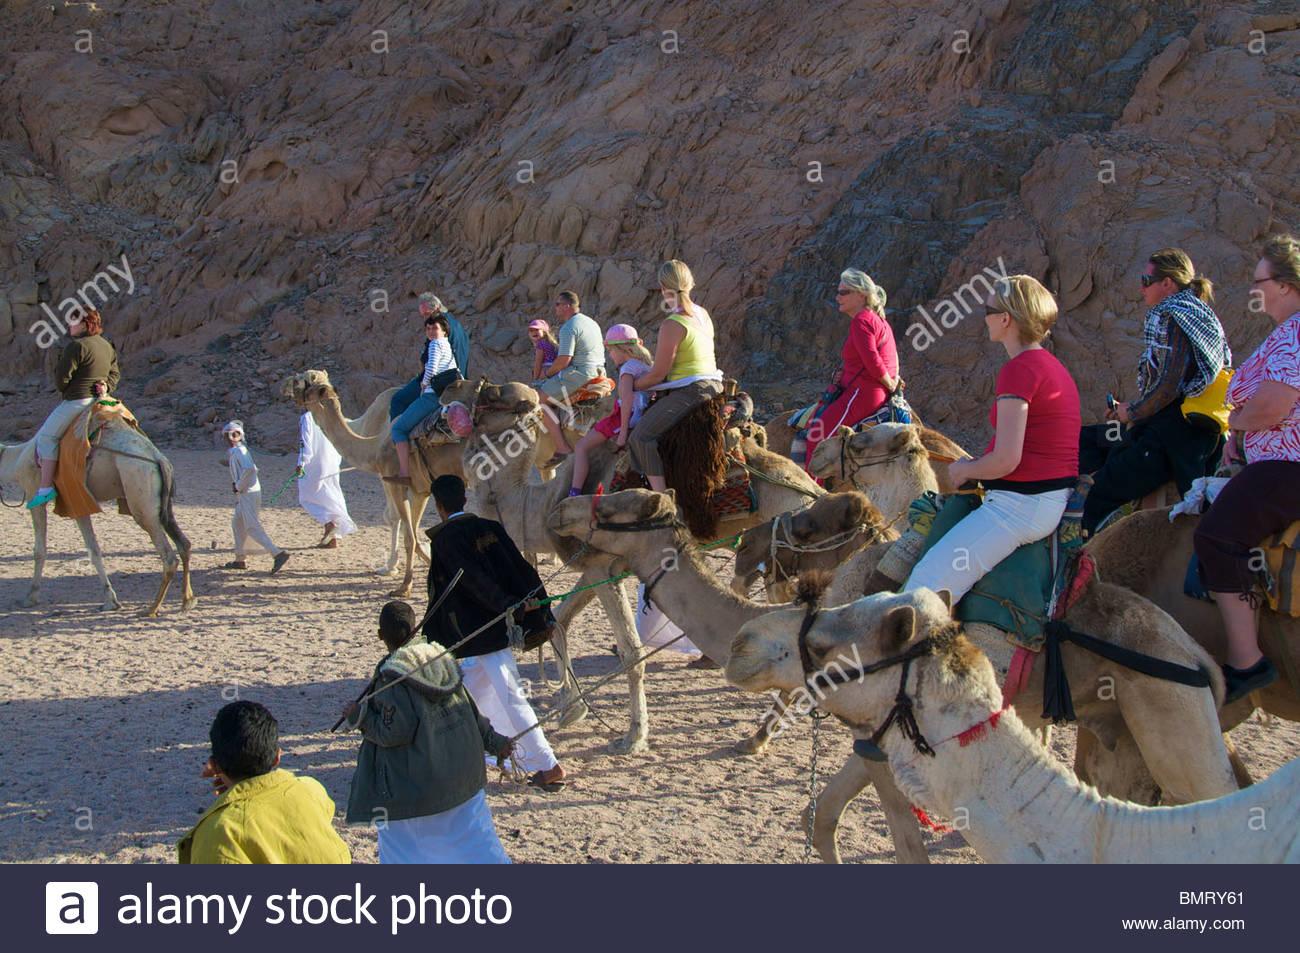 Desert Excursion Sharm el Sheikh Egypt - Stock Image